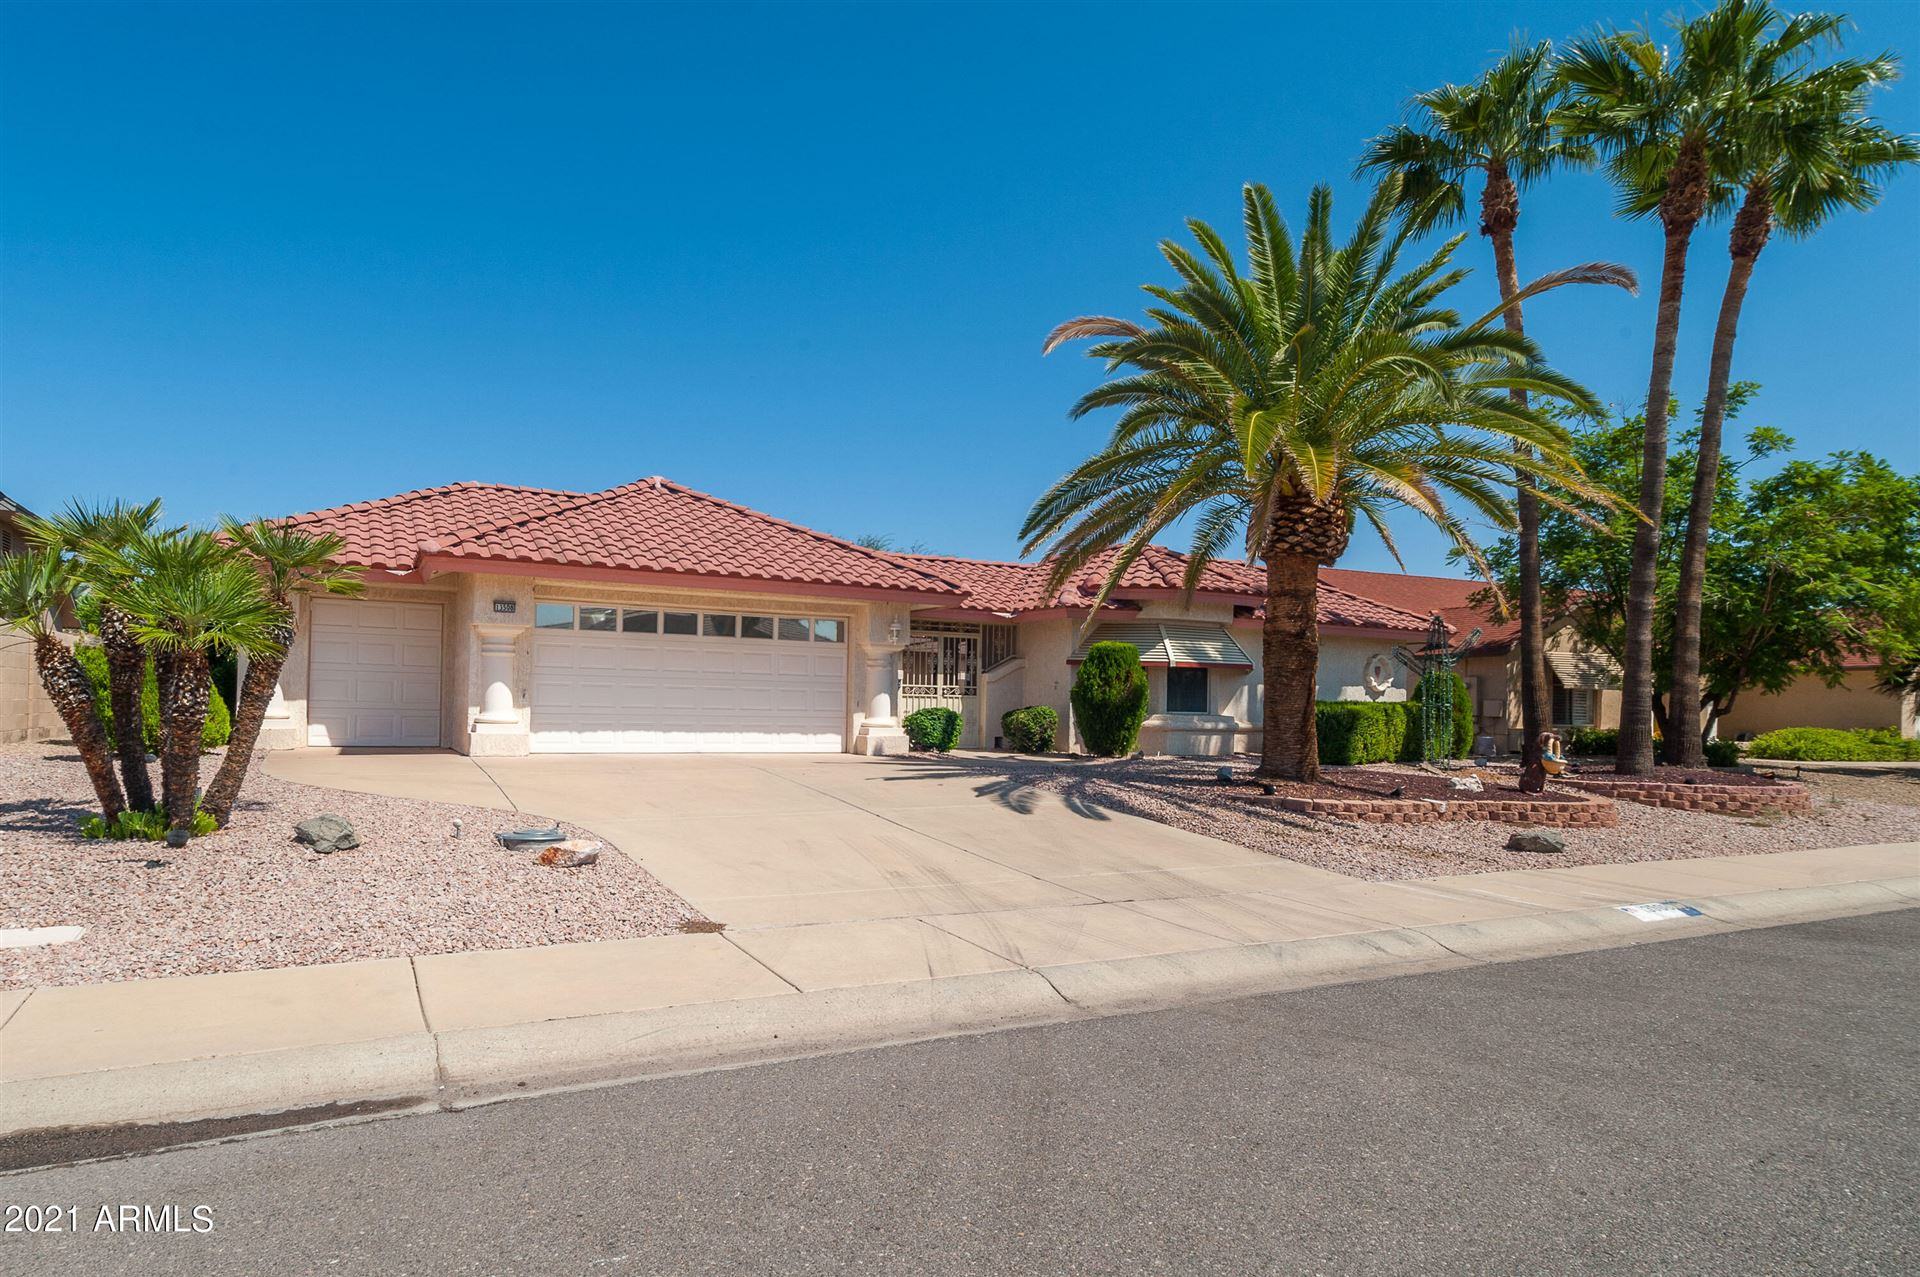 13508 W WHITE WOOD Drive, Sun City West, AZ 85375 - MLS#: 6285423